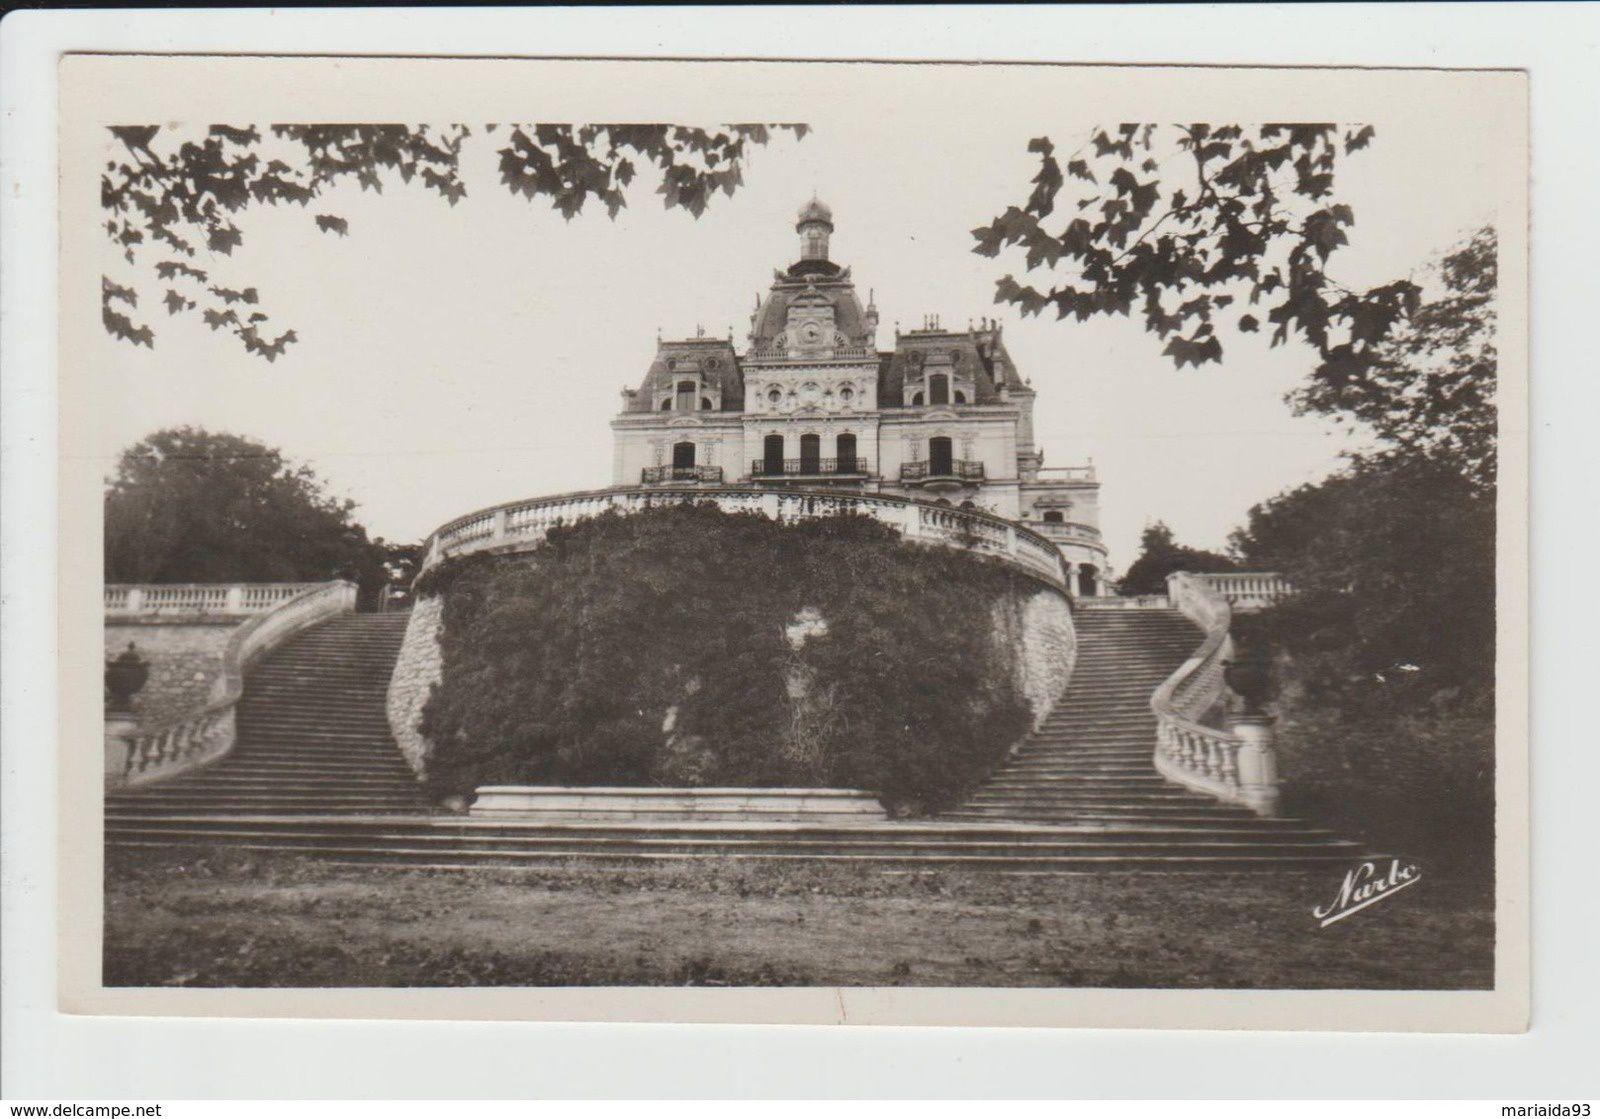 CÉRET (Le château d'Aubiry)